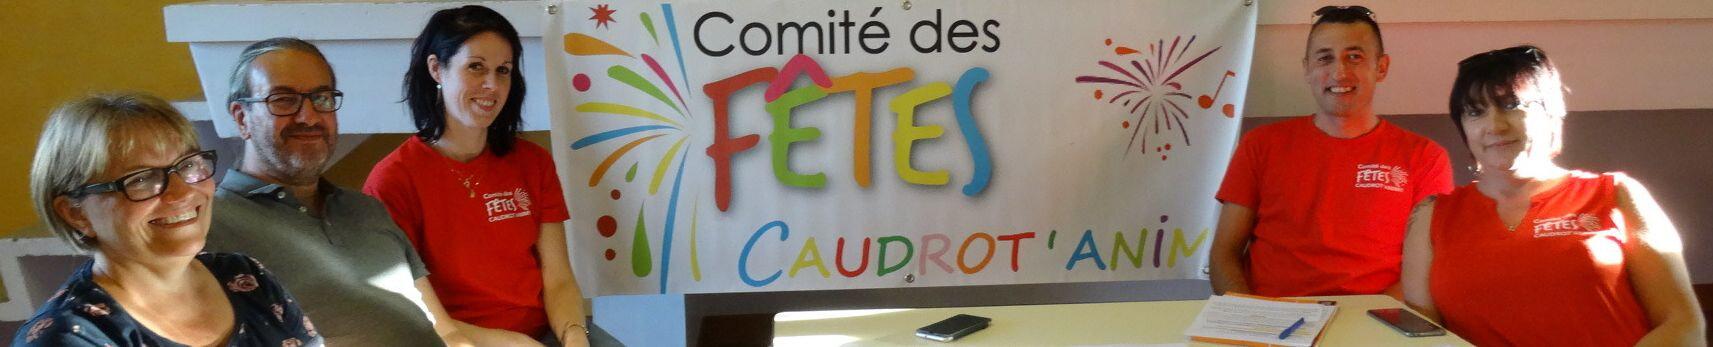 FORUM Associations Caudrot 6 septembre 2019 (53)